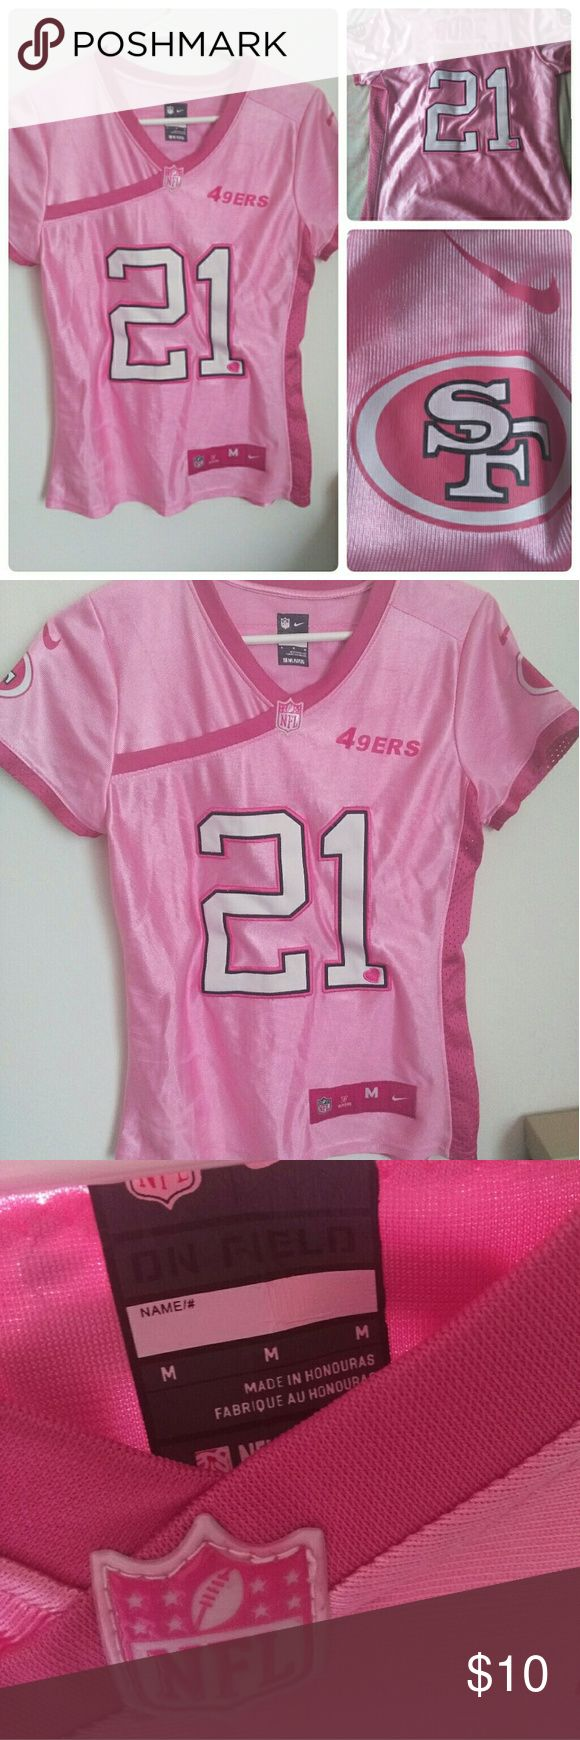 "Pink San Francisco 49ers Fan Jersey Sz Medium San Francisco 49ers Frank Gore fan jersey. Only worn a couple times.  Approximate measurements: Bust 13.5"" Shoulder to shoulder 14"" Length 23"" Tops"